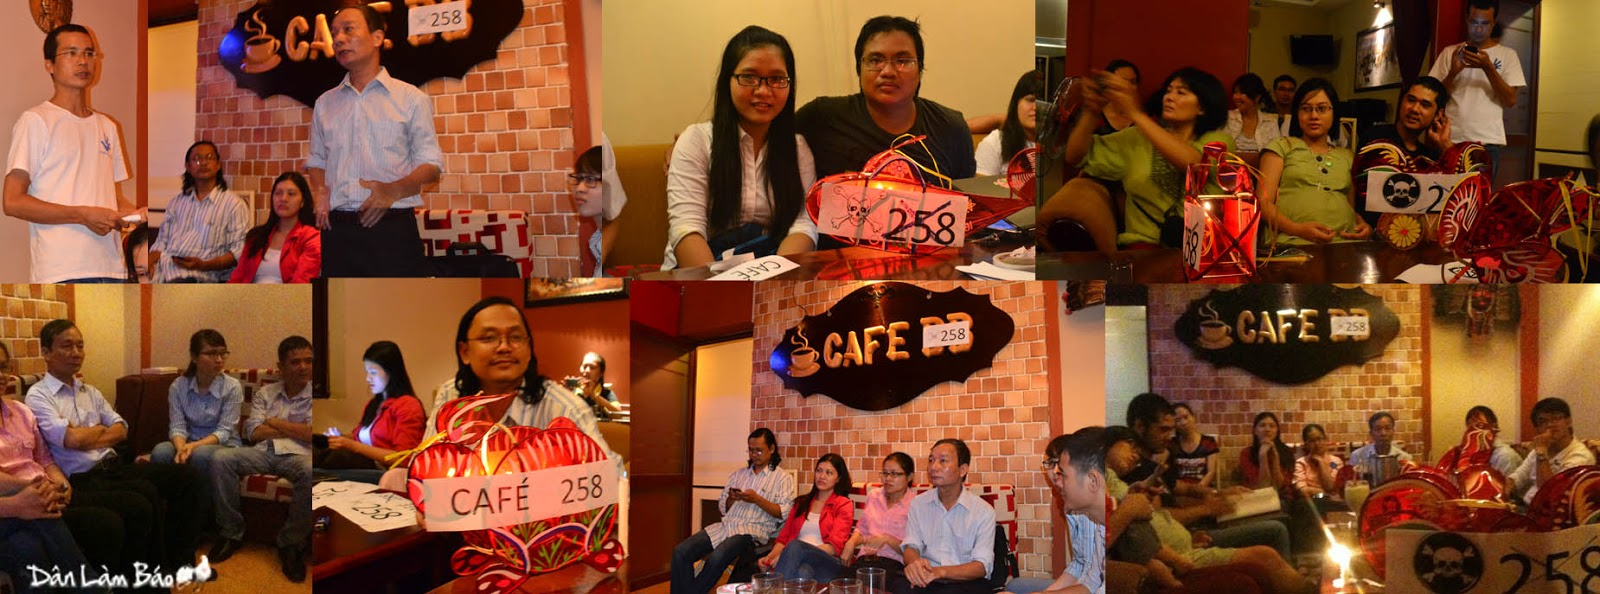 Saigon-caphe258-danlambao